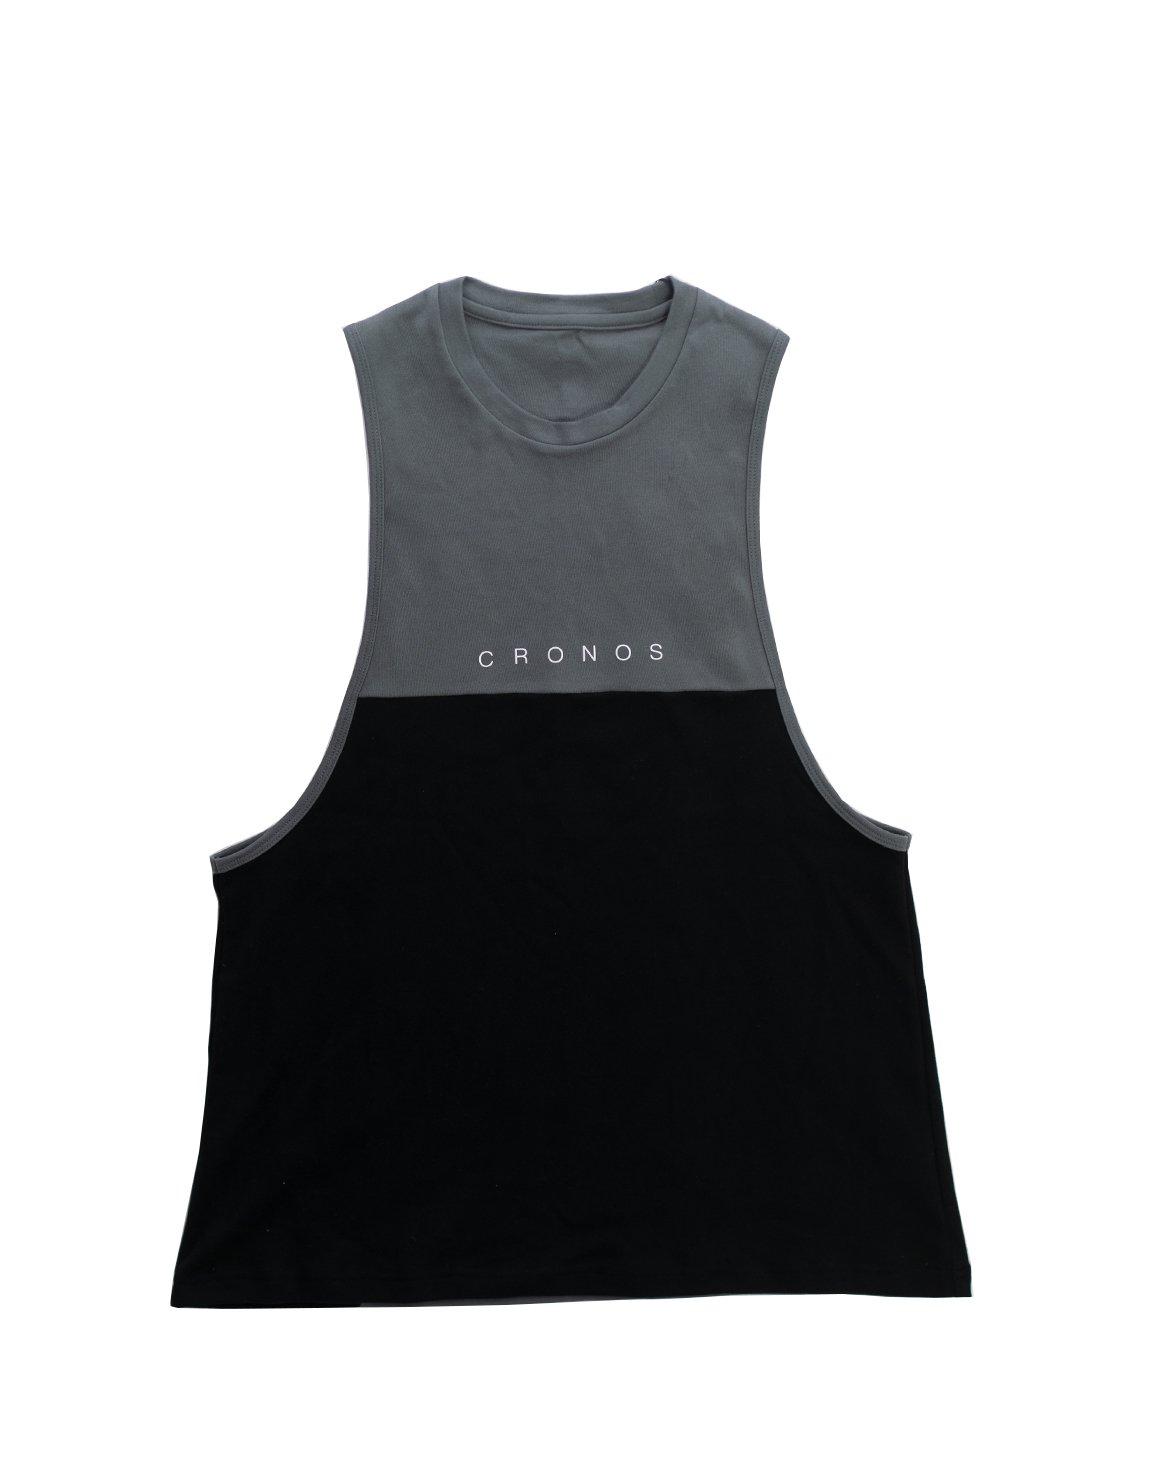 CRONOS TWO BI-COLOR TANKTOP【BLACK×C.GRAY】